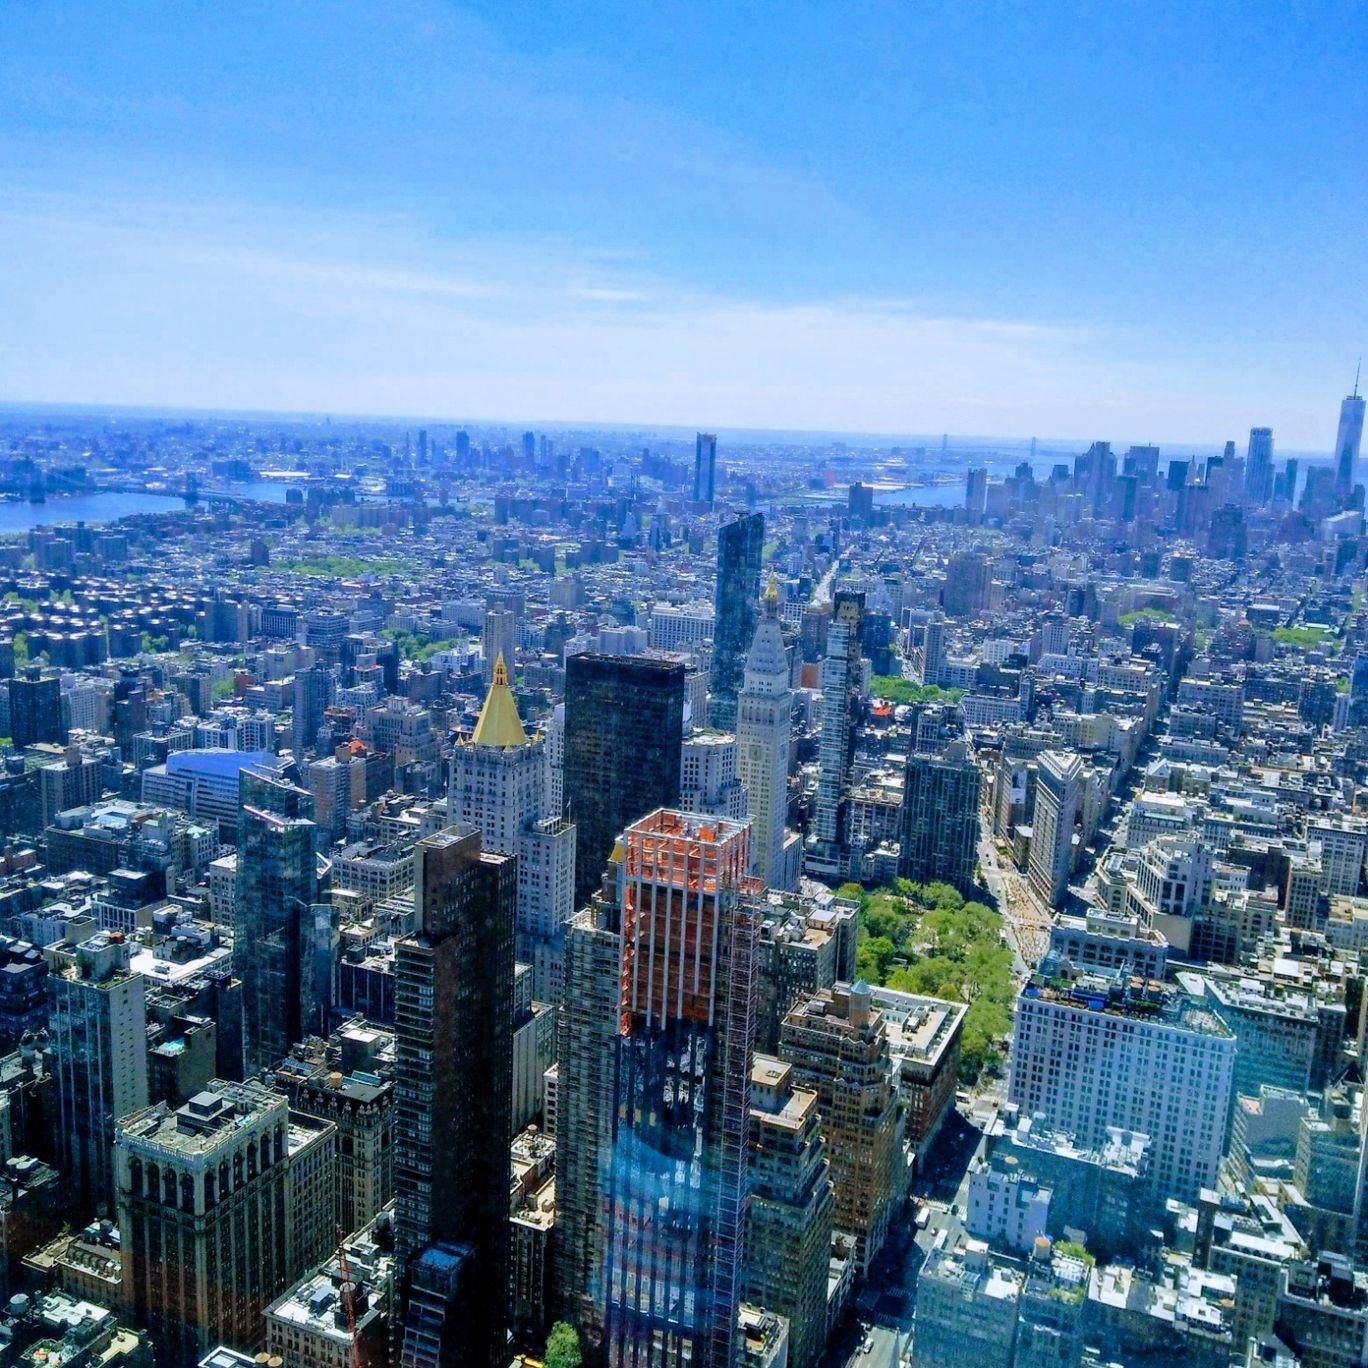 Photo of Empire State Building By Narmadha Sivakumar